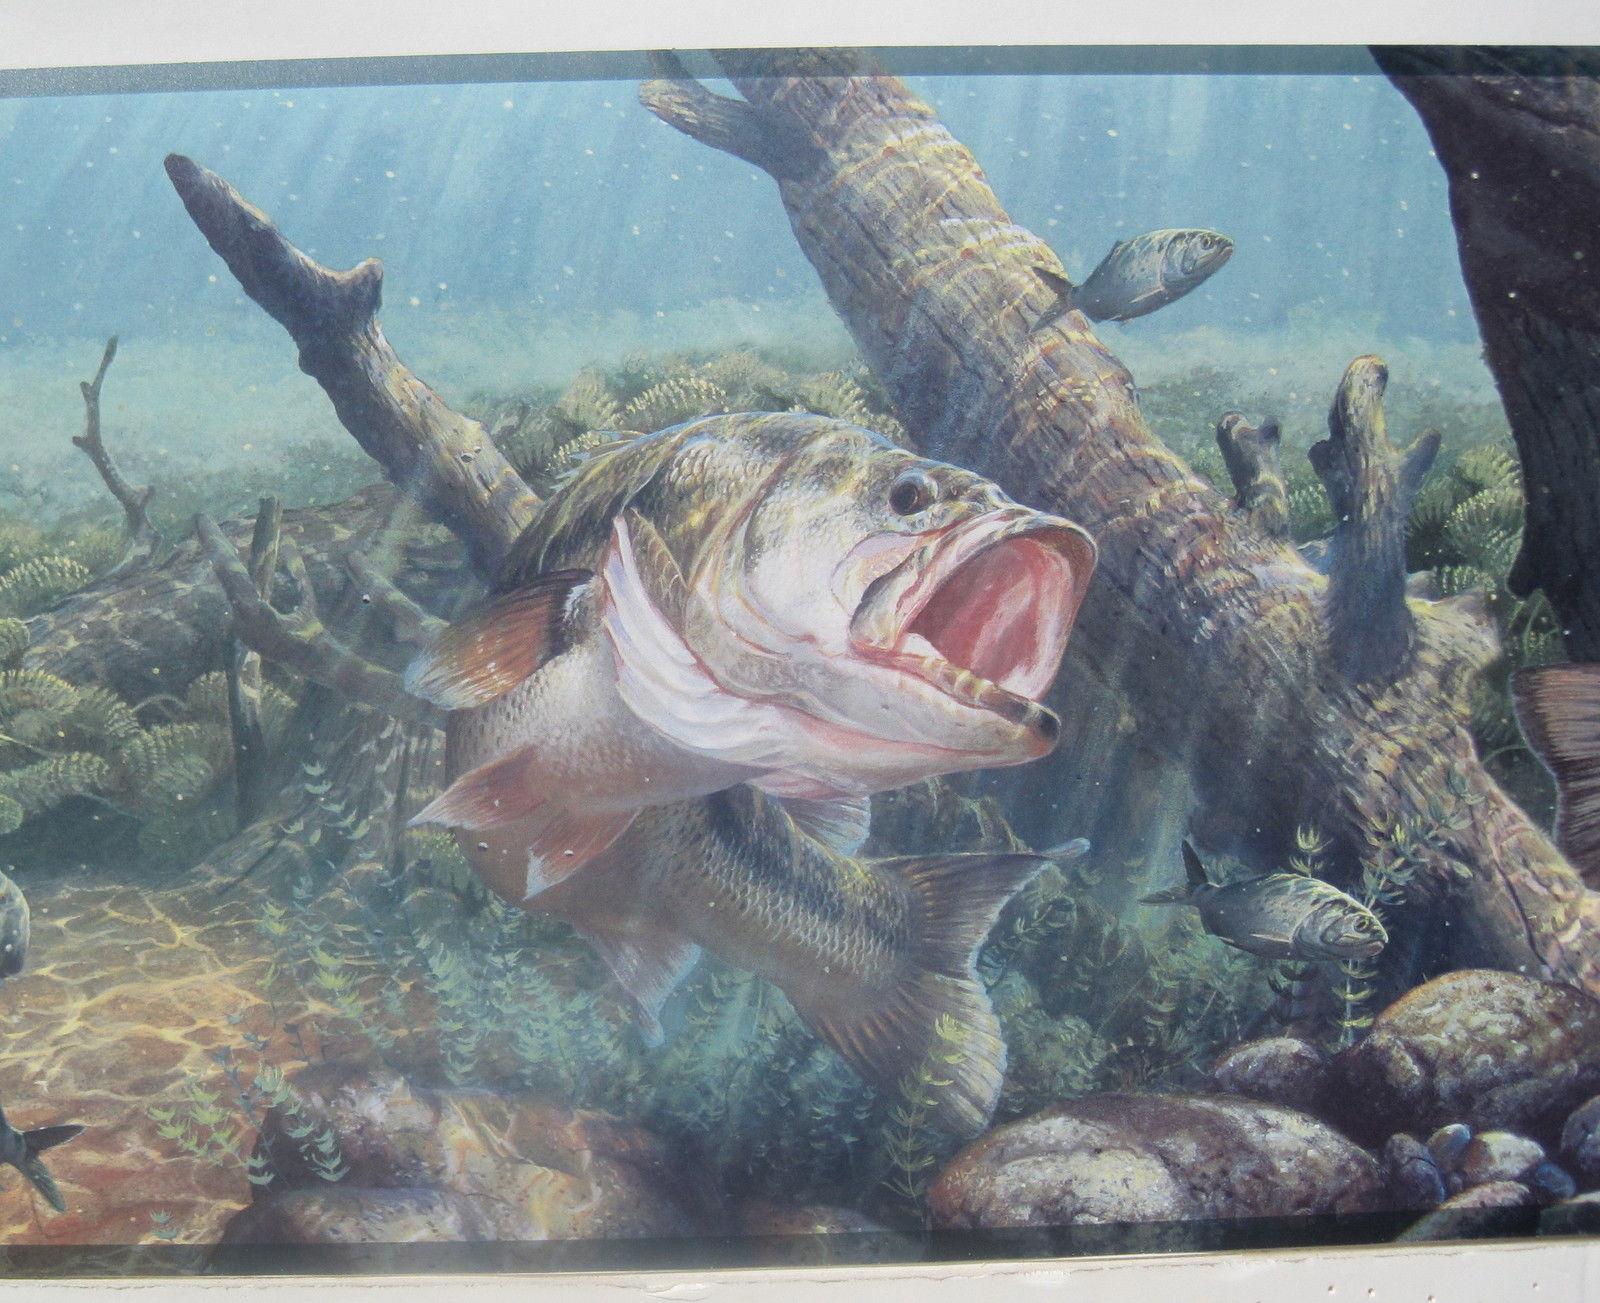 BASS FISHING FRESH WATER FISHING Wallpaper Border 9 57jpg 1600x1303